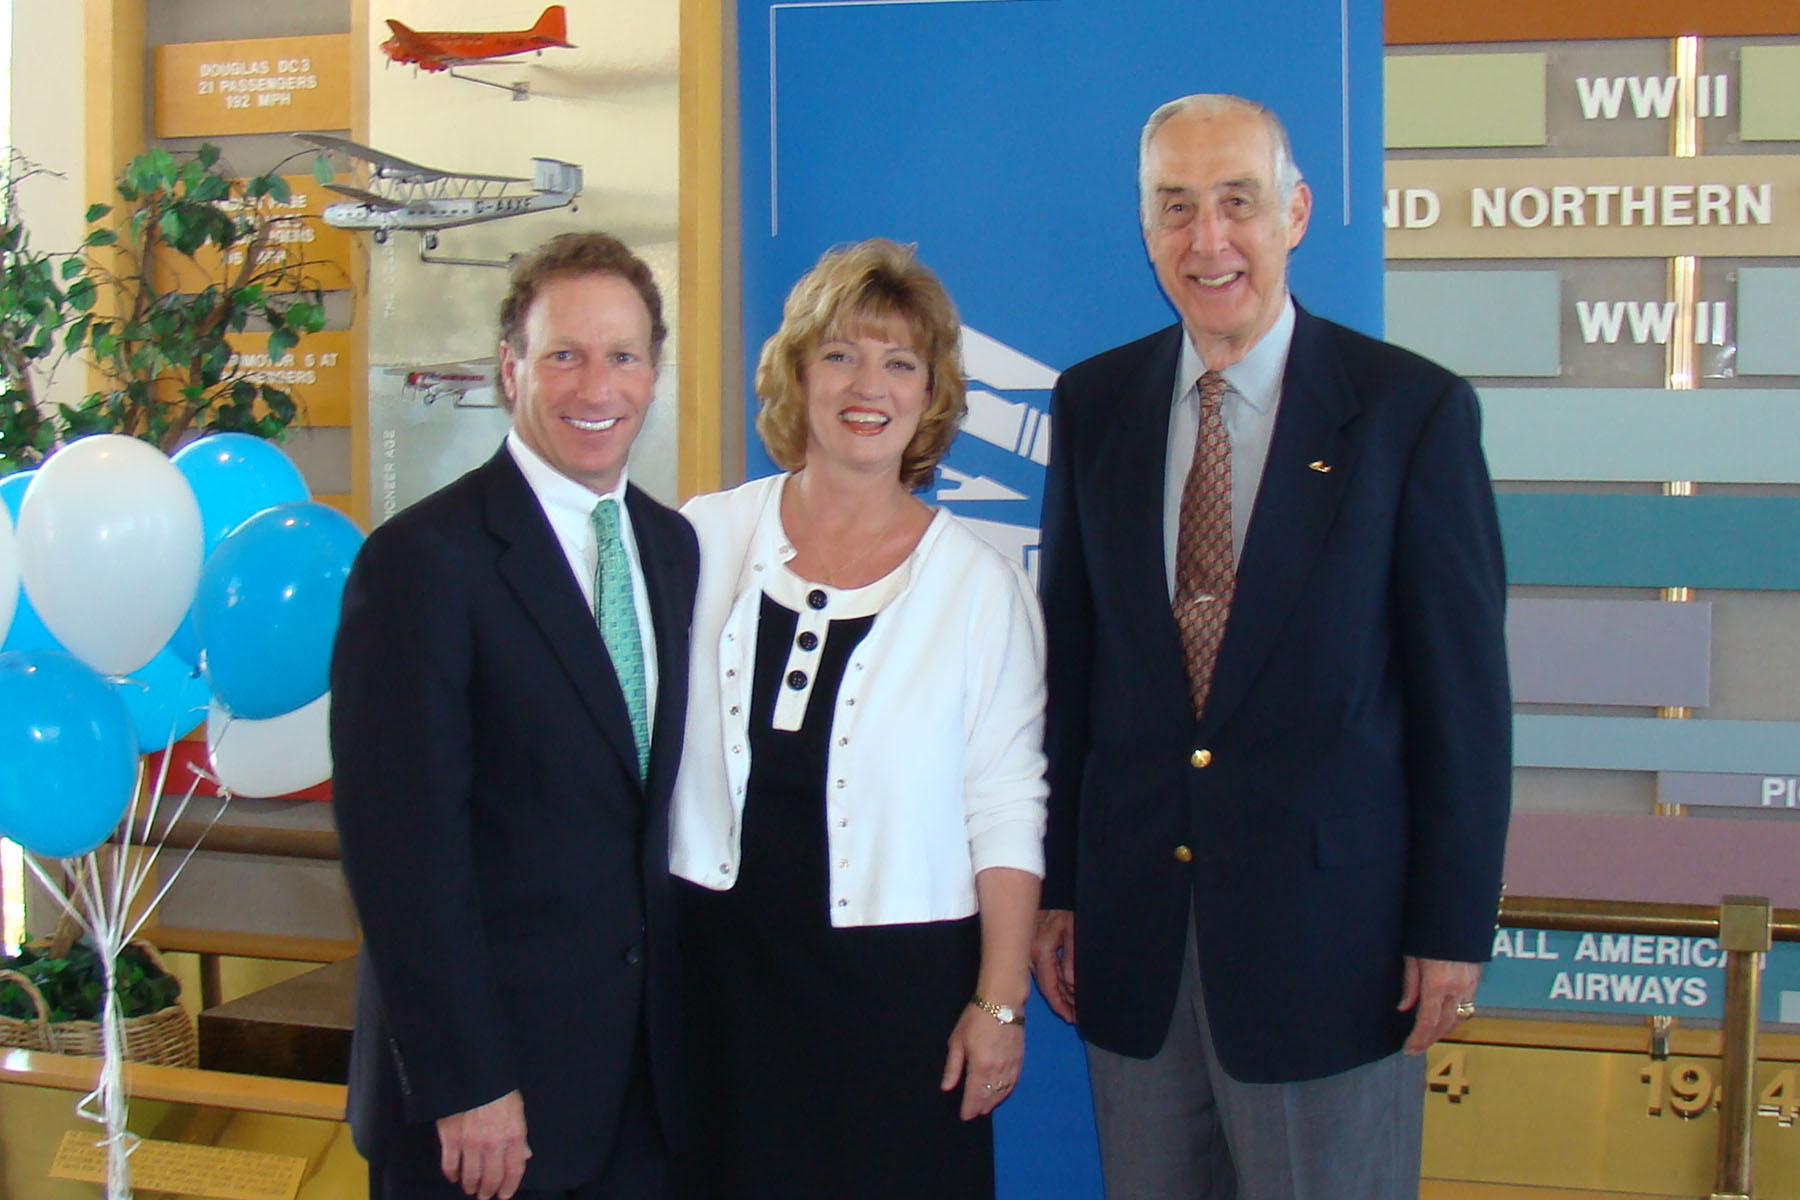 David Hilfman, Colleen Picard & Dick Newton @ SPMOH - 2, 27 Mar '08.jpg